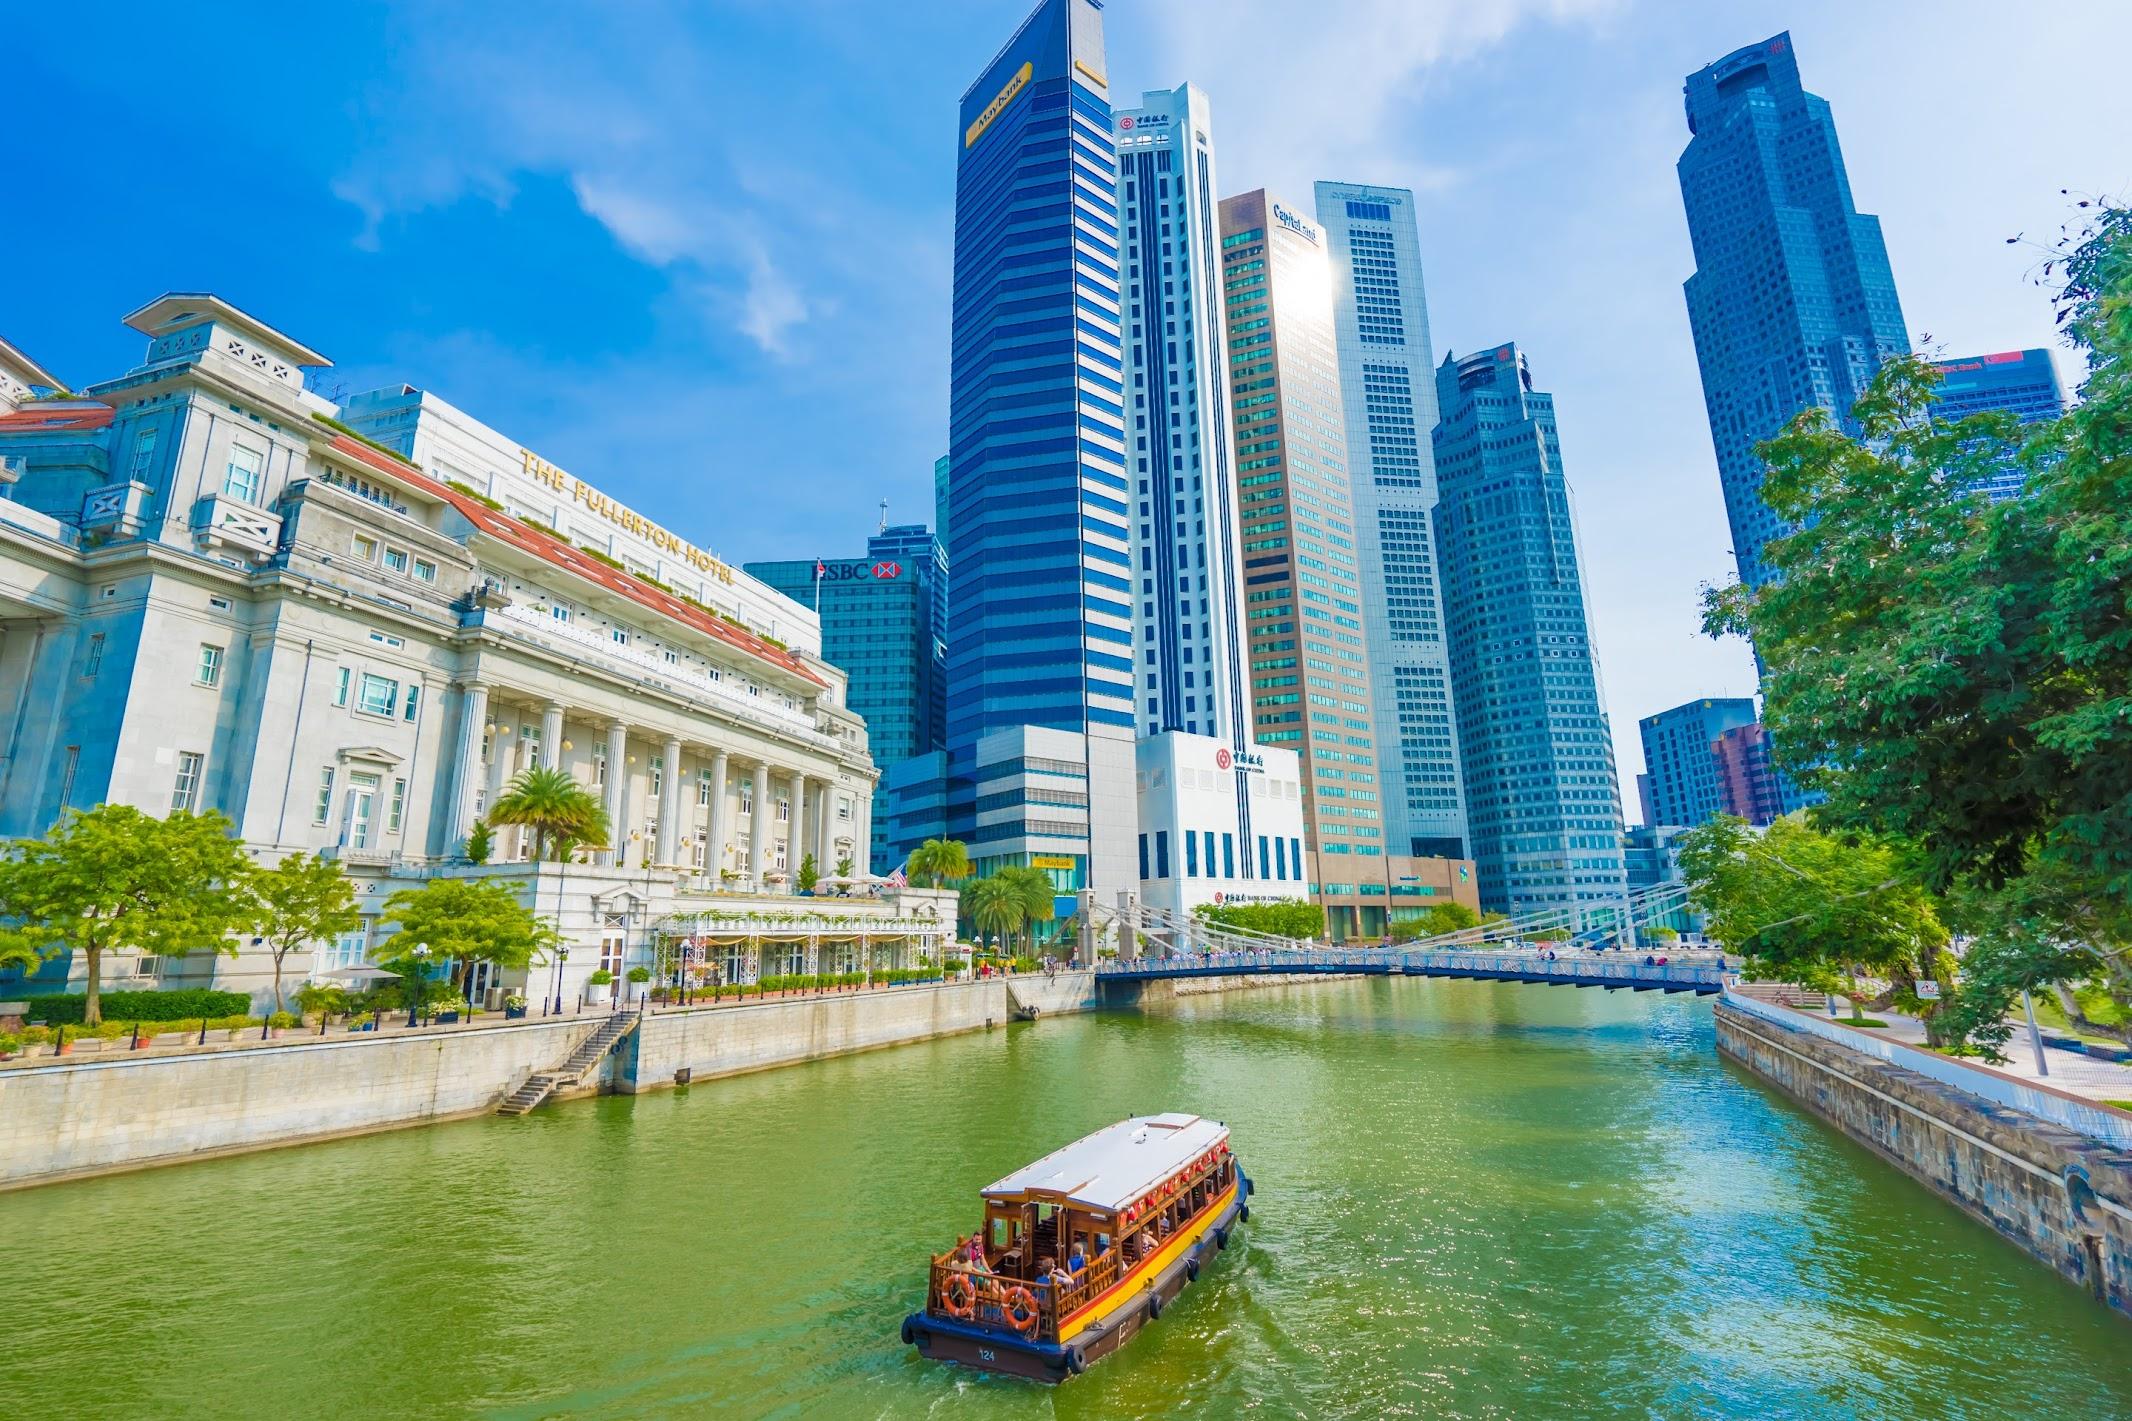 Singapore Fullerton Hotel River Cruise2